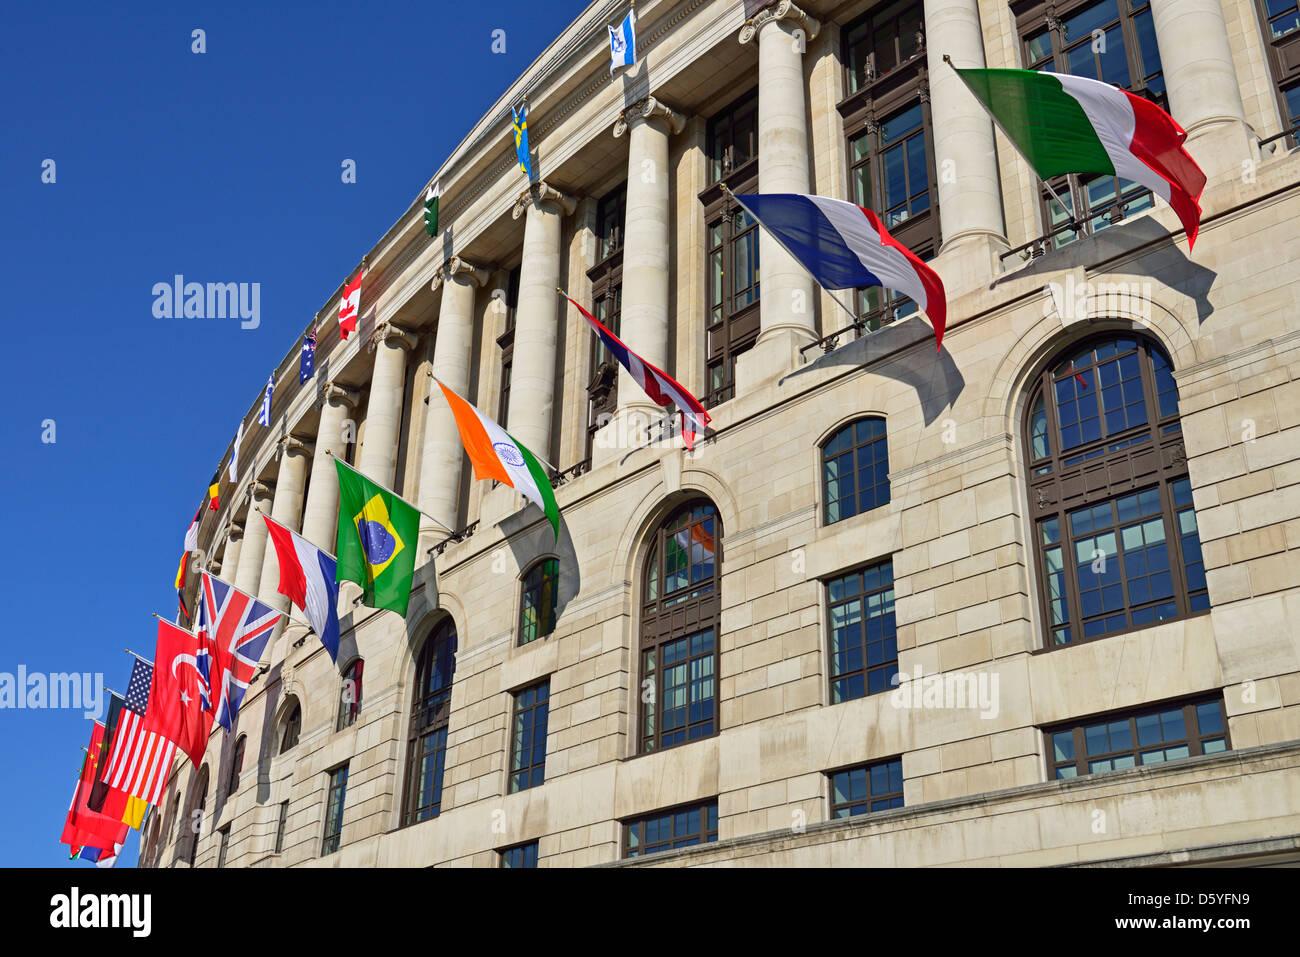 Unilever House, 100 Victoria Embankment, London, United Kingdom - Stock Image